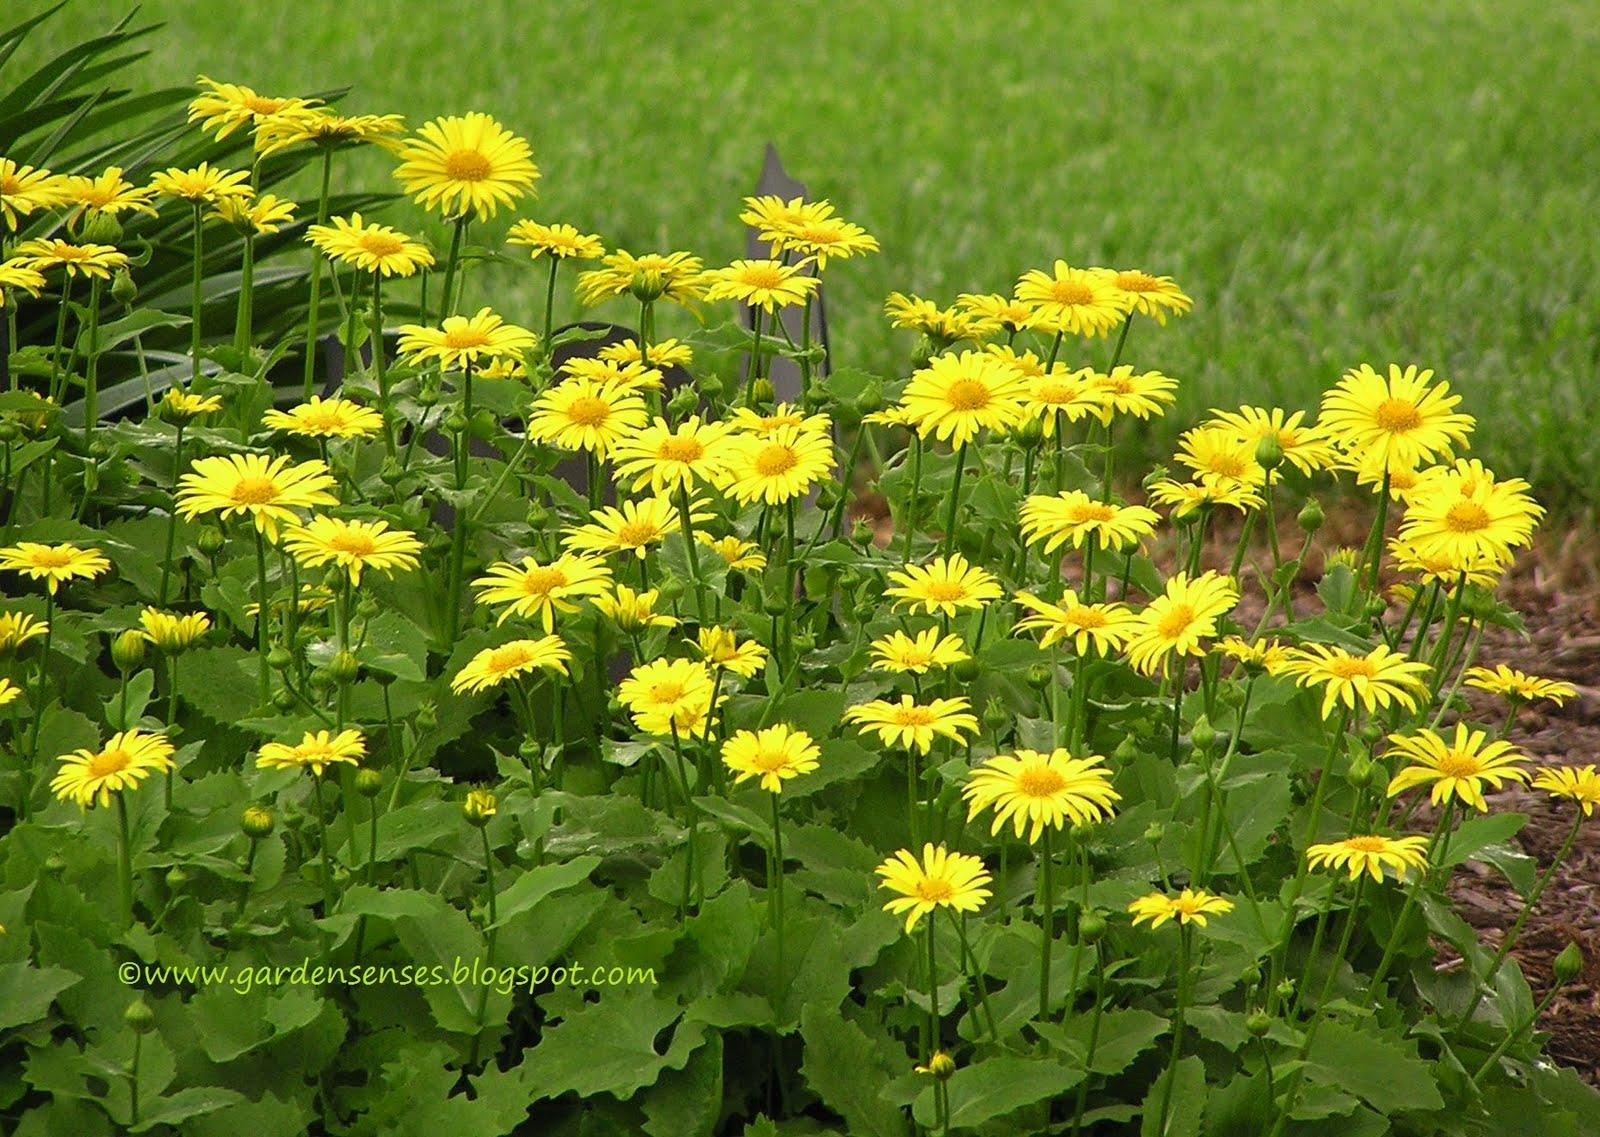 Garden Sense Spring Blooms Ii